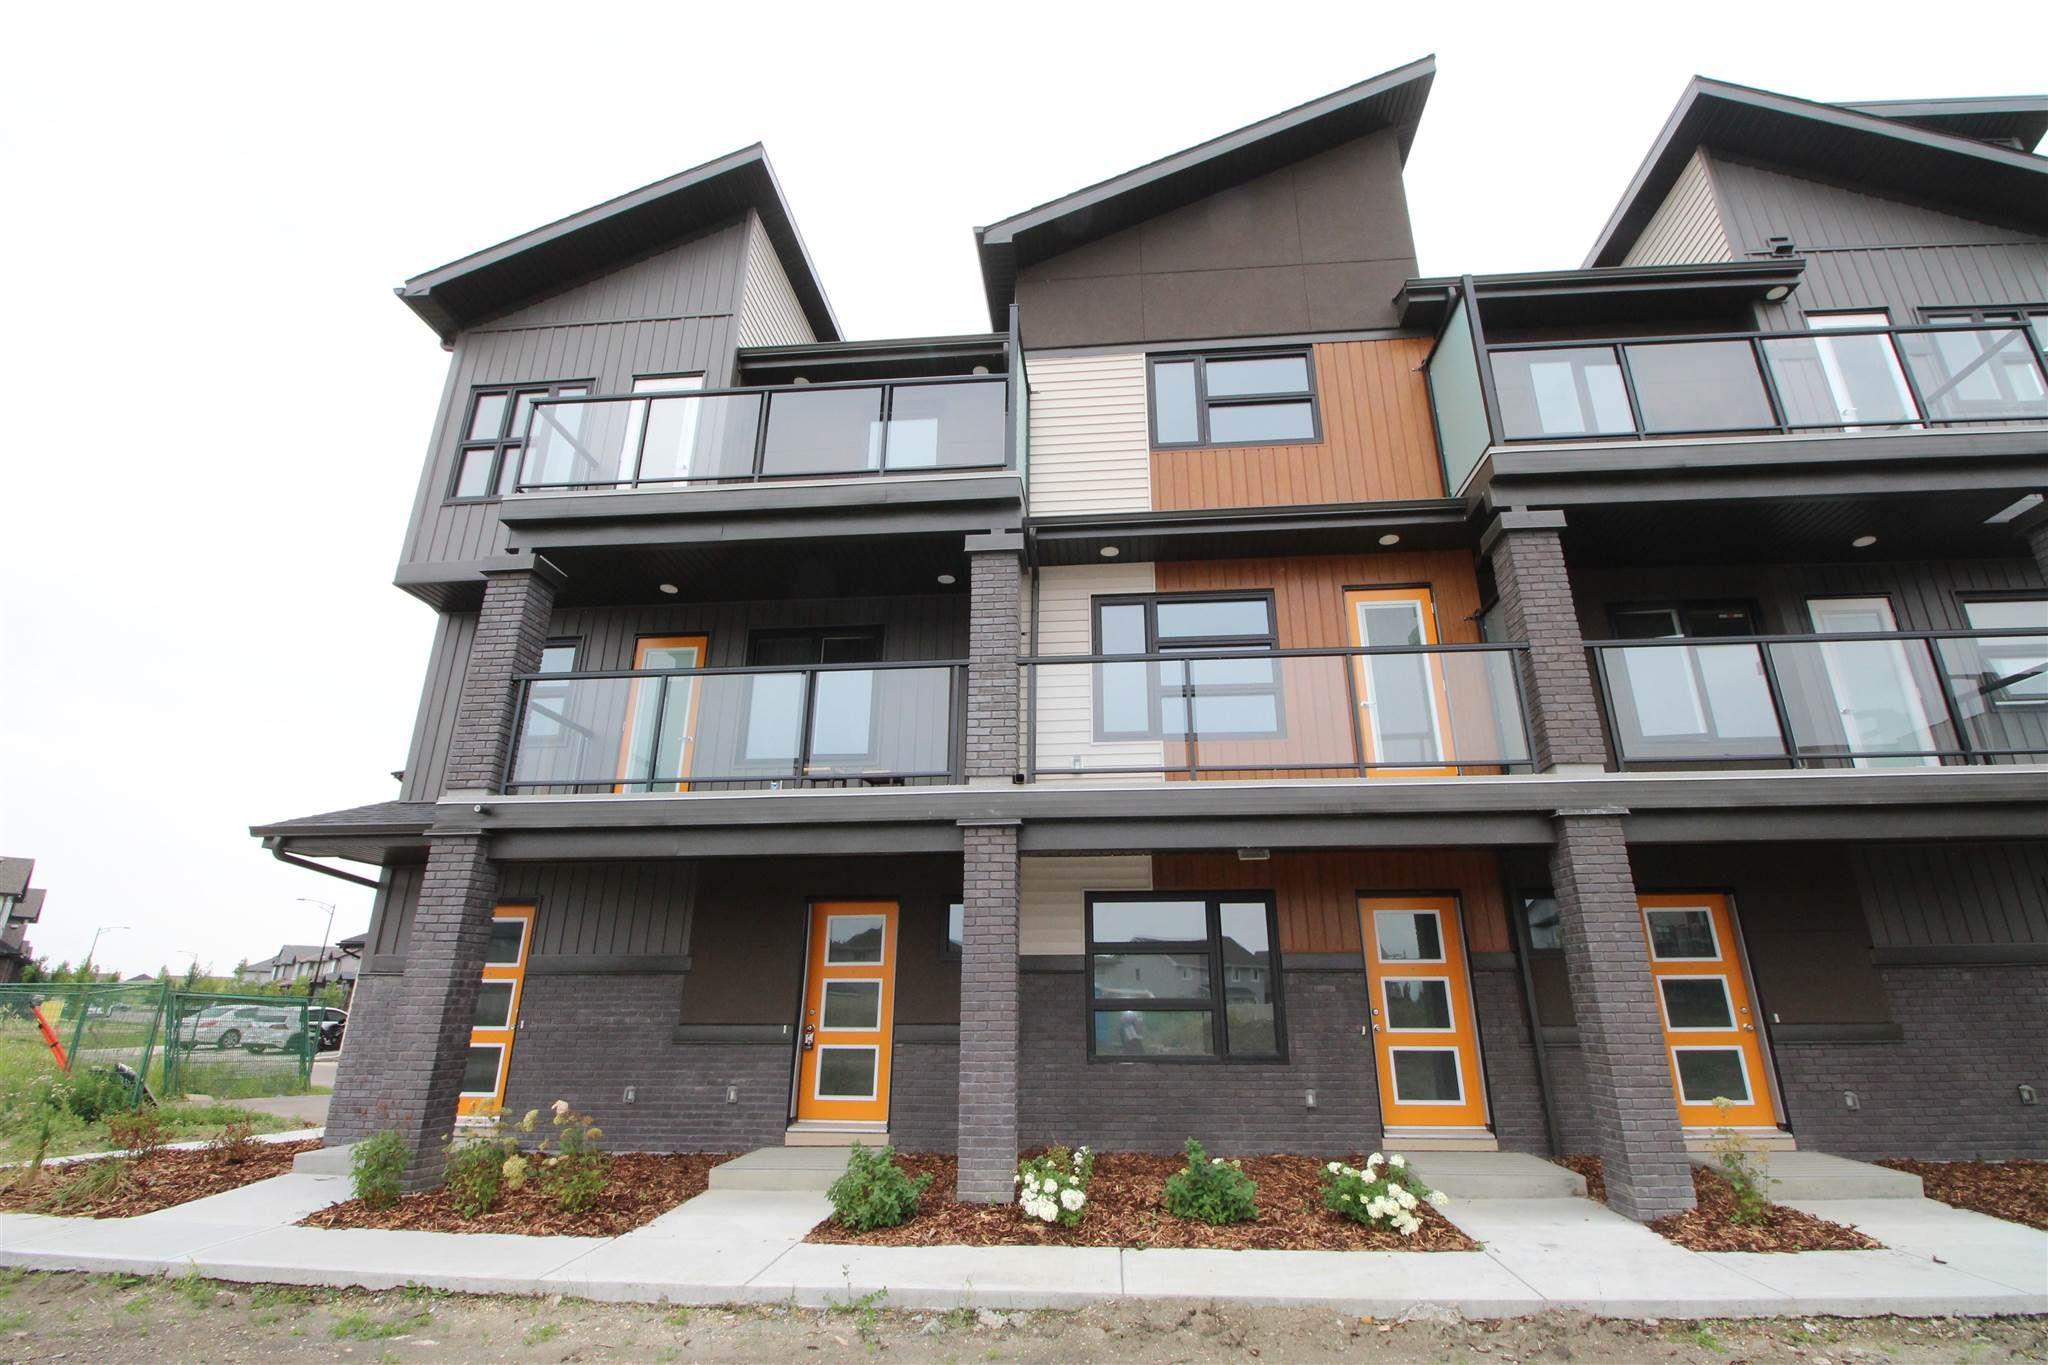 Main Photo: 46 1203 163 Street in Edmonton: Zone 56 Townhouse for sale : MLS®# E4228196